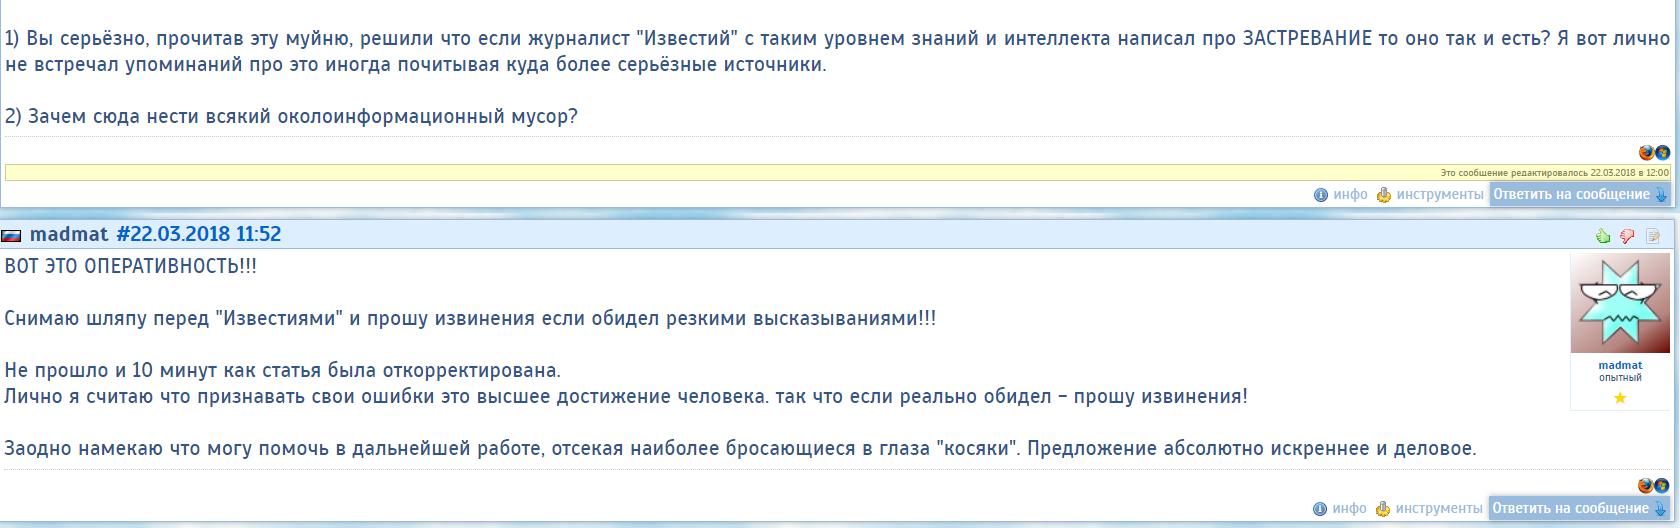 http://s5.uploads.ru/gdTh4.png